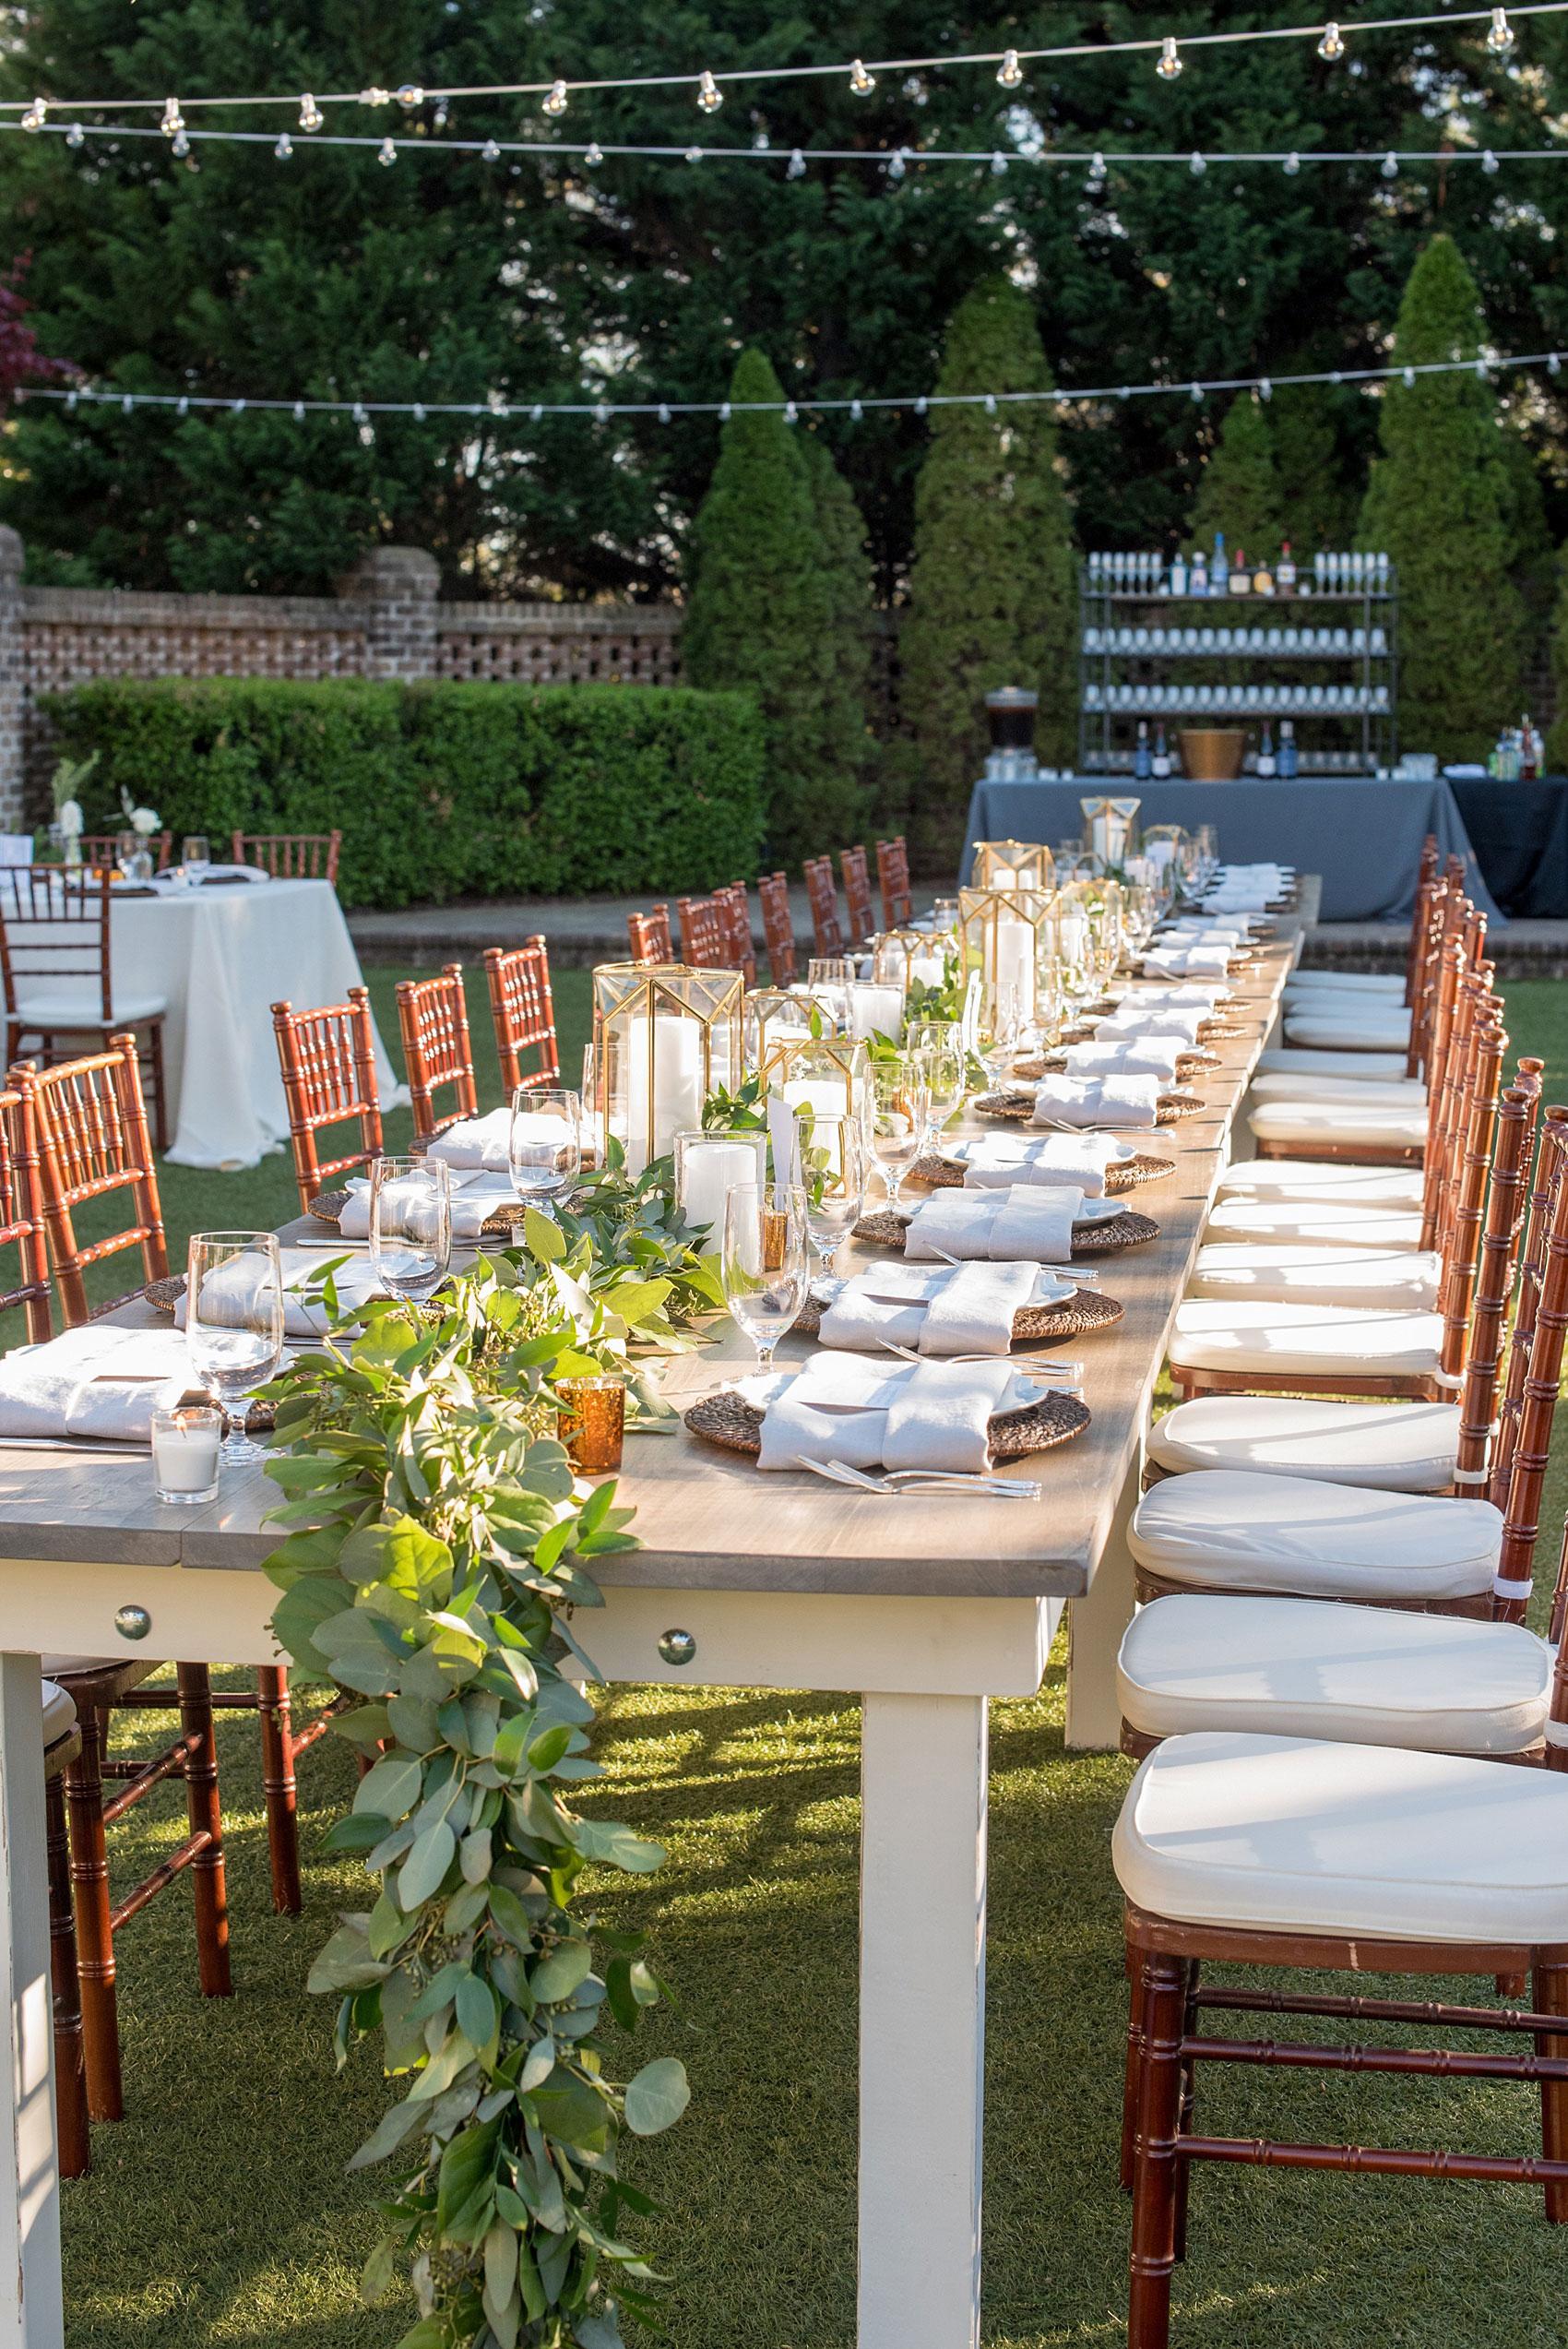 The Sutherland Wedding Photos Wake Forest North Carolina - Farm table wake forest nc